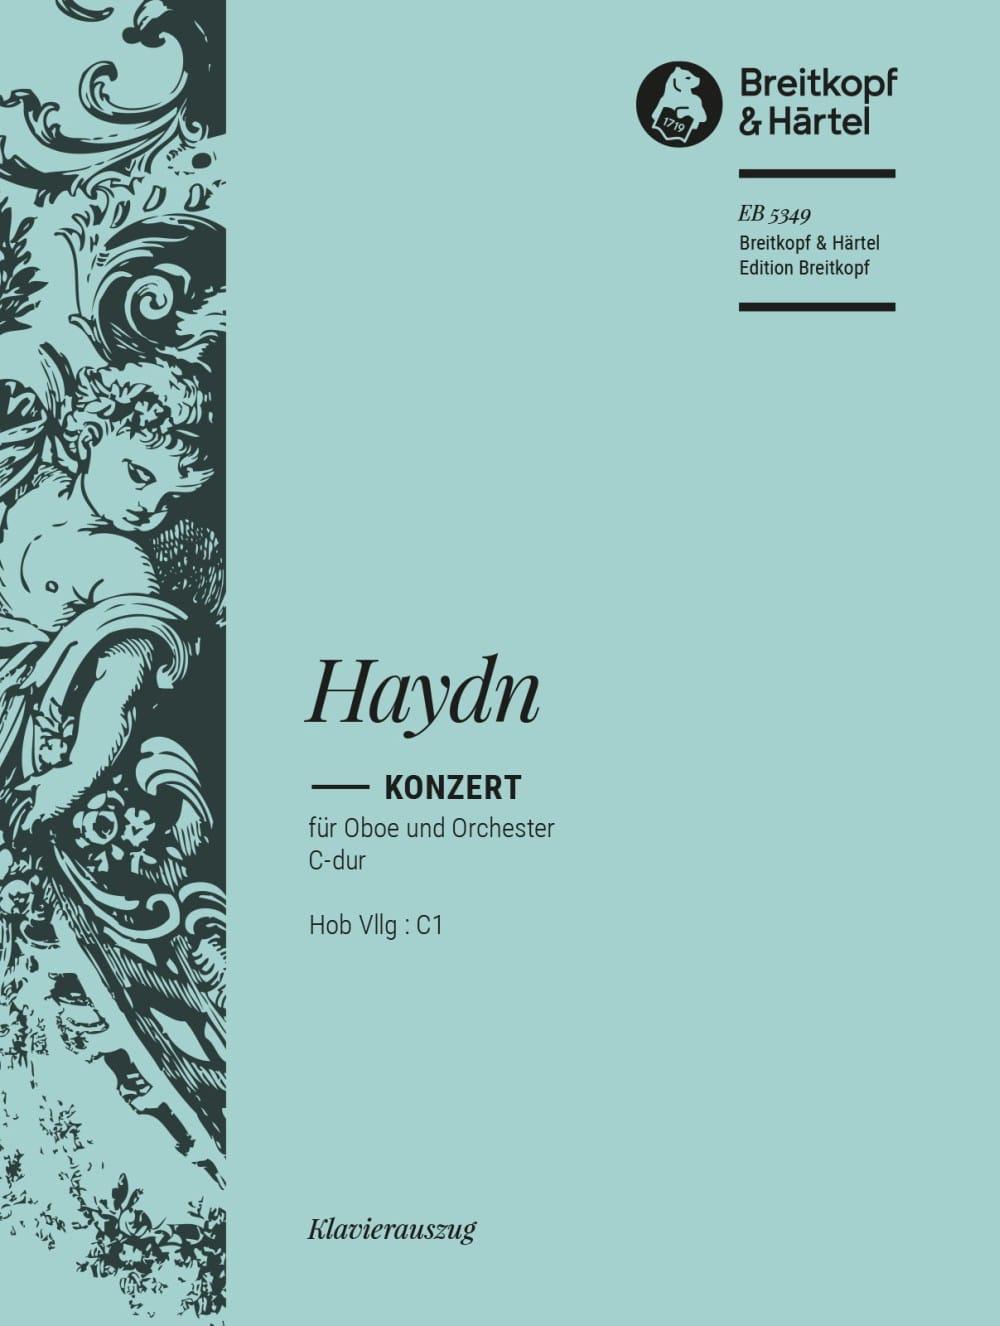 Oboenkonzert C-Dur Hob 7g : C1 - Hautbois piano - laflutedepan.com